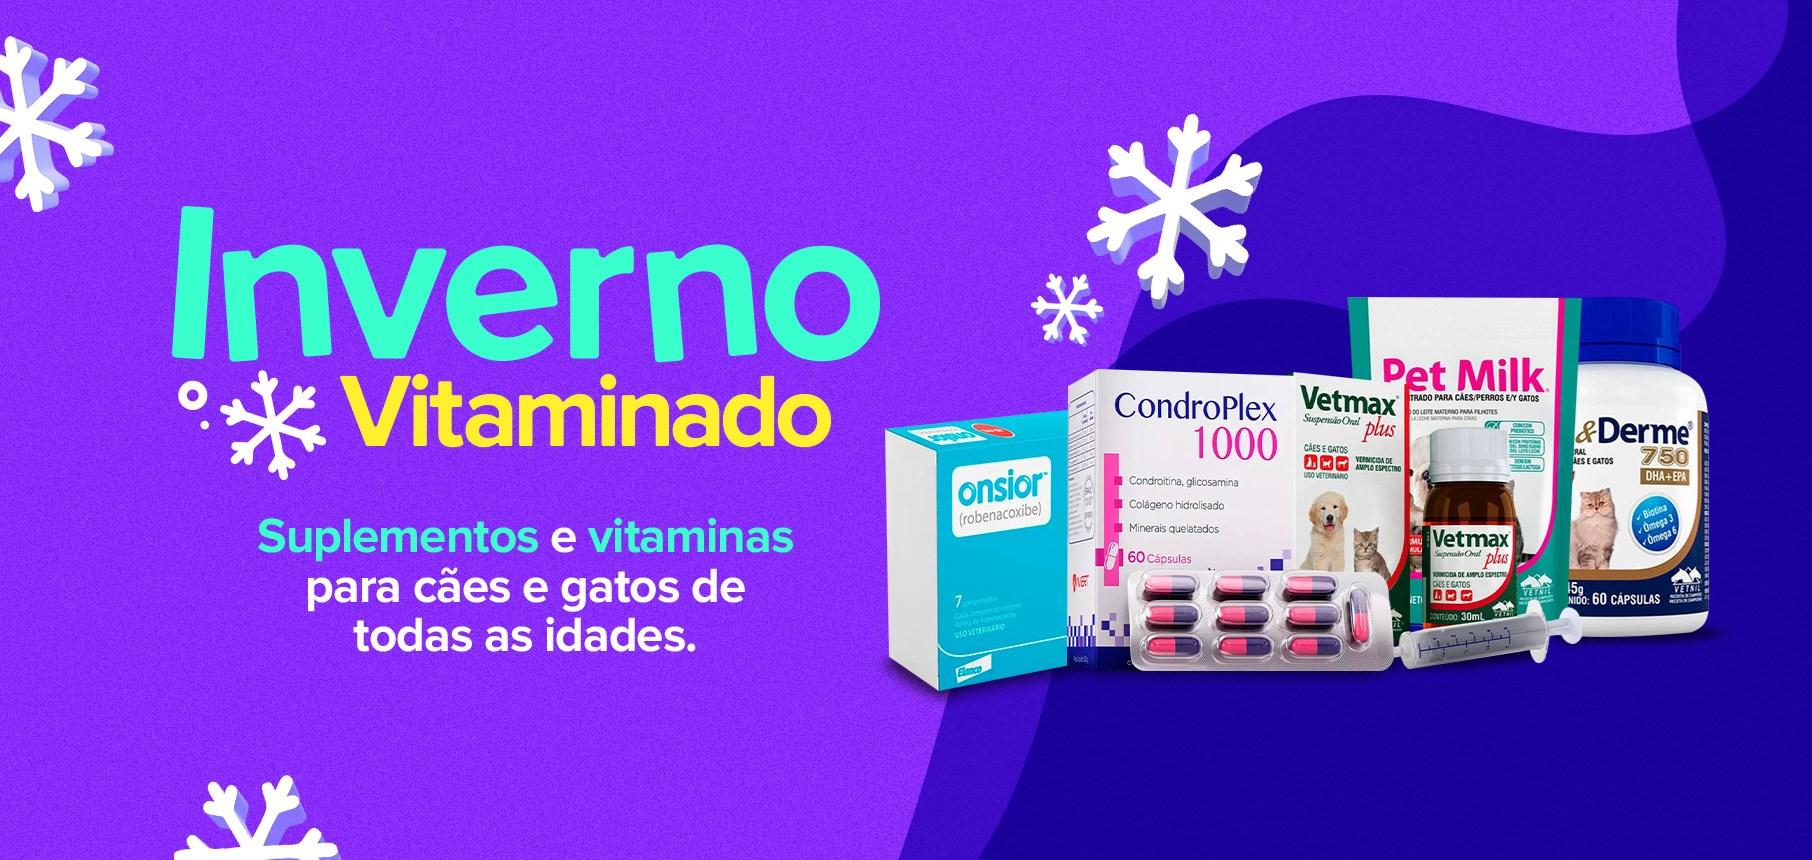 Inverno vitaminado